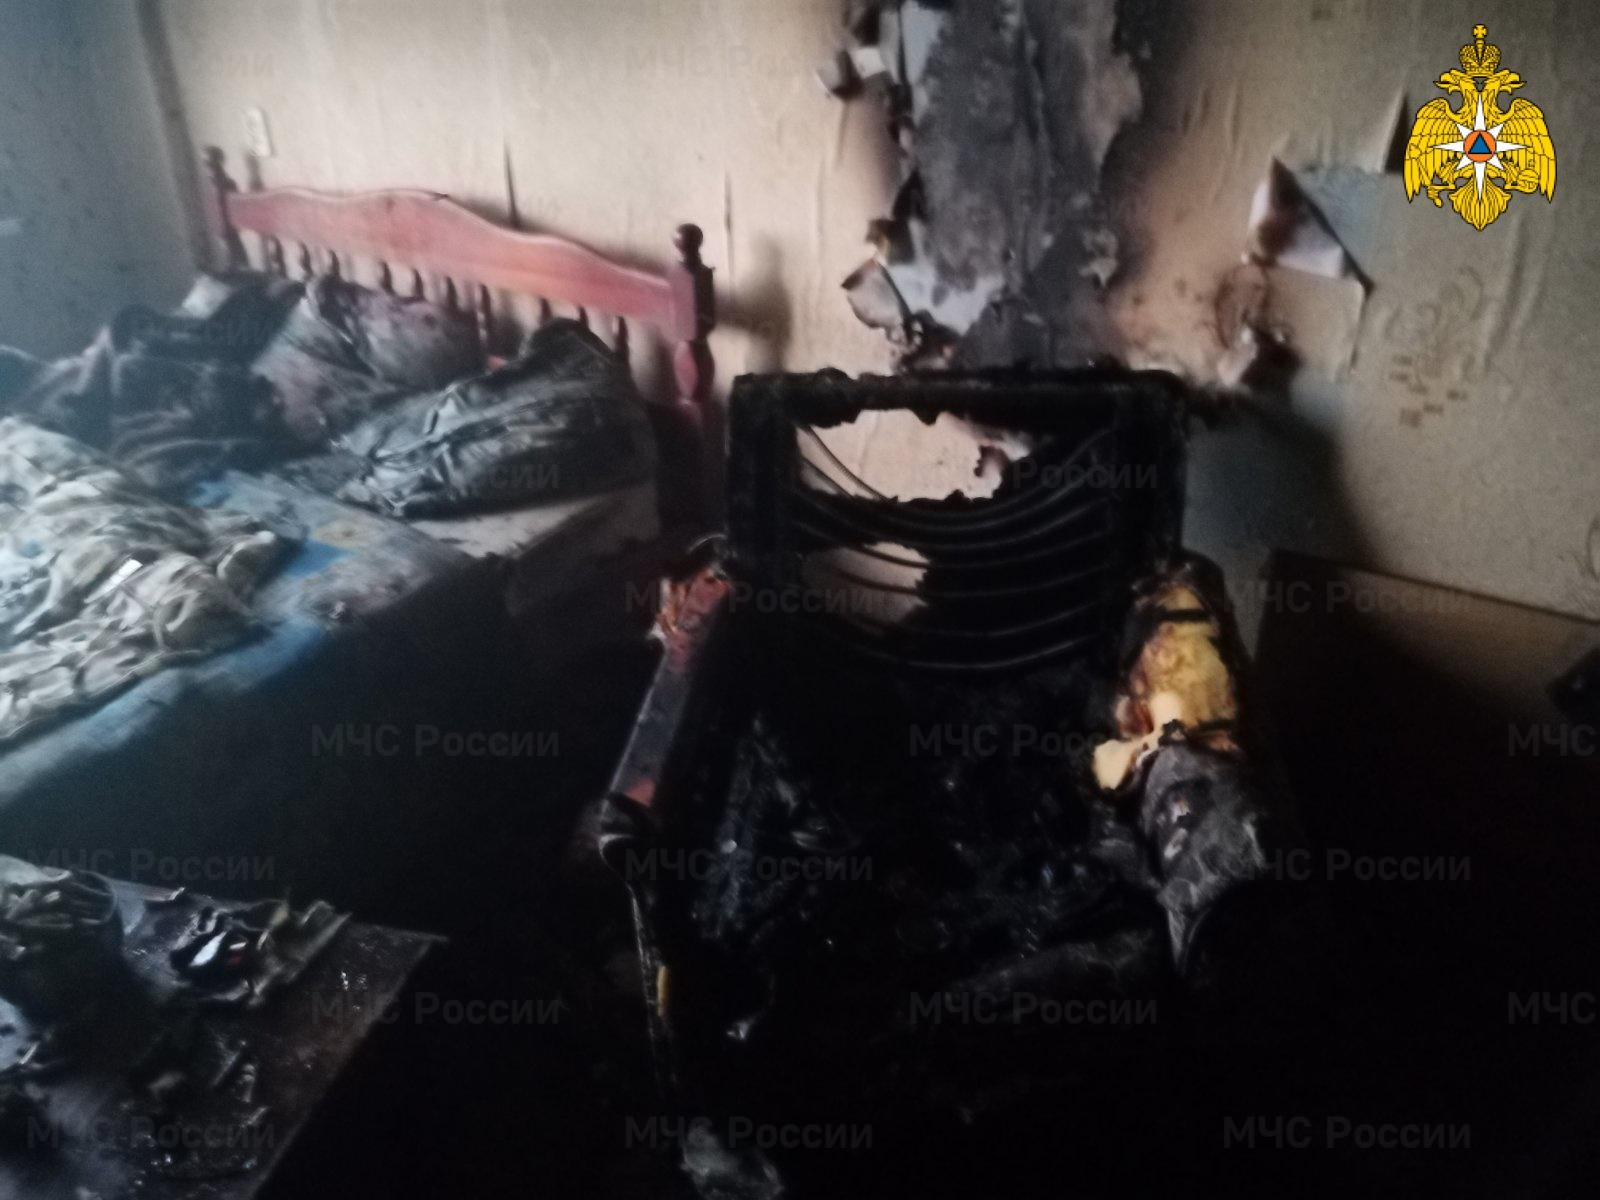 Пожар в Дзержинском районе, г. Кондрово, ул. Пушкина